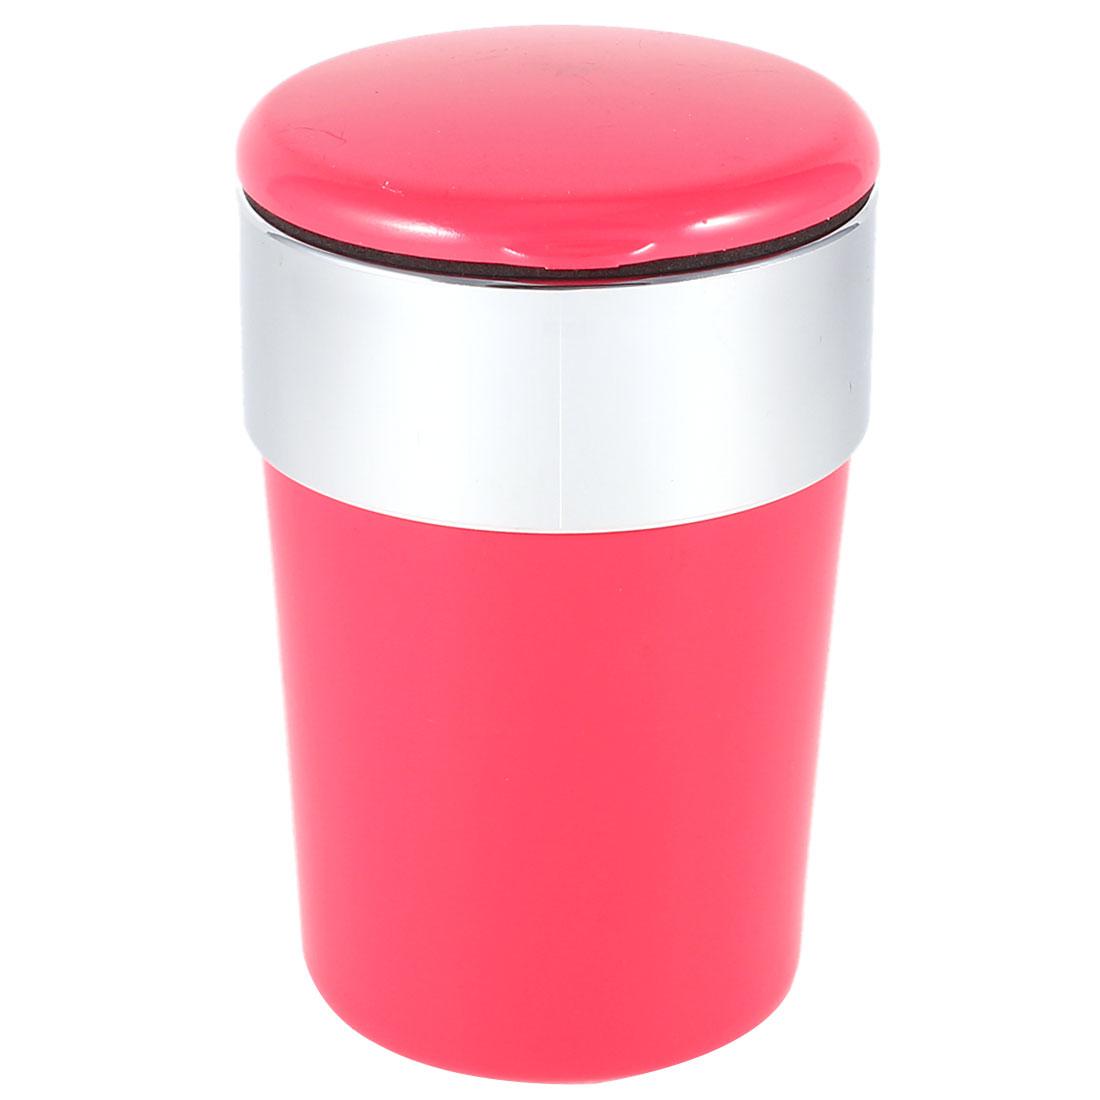 Automatic Red Plastic Flap Lid Blue LED Light Cigarette Ashtray Holder